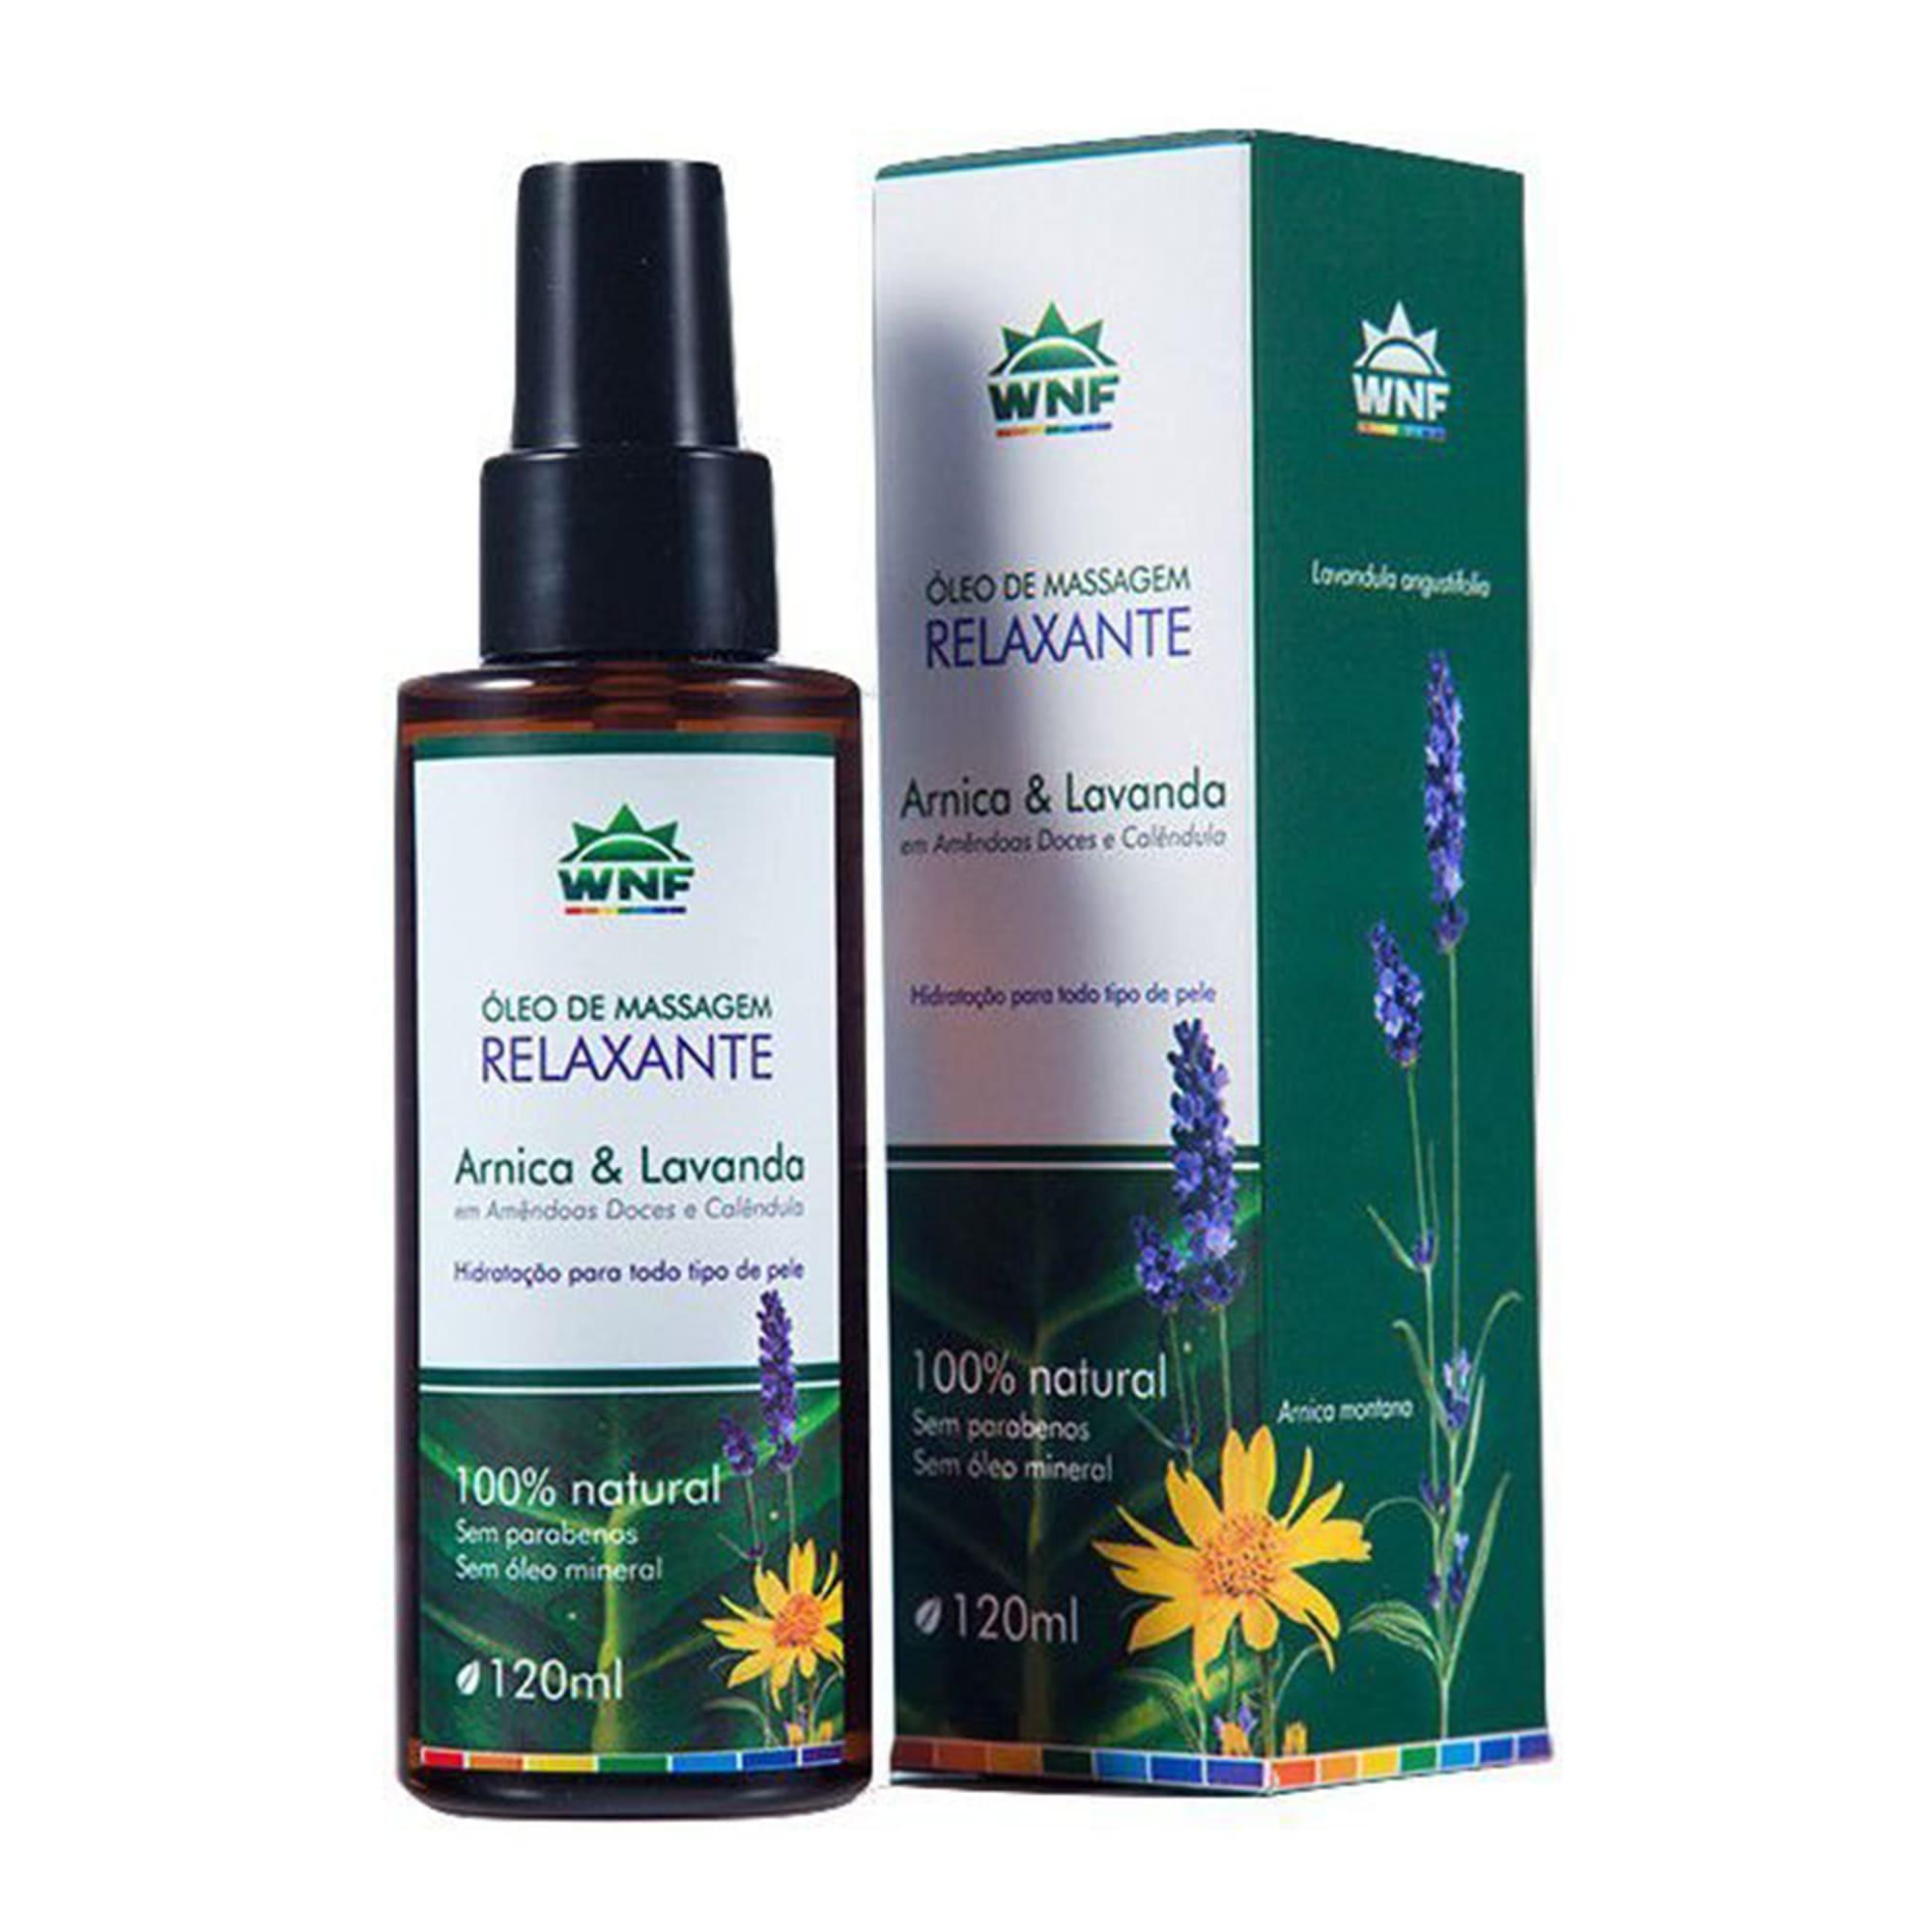 Óleo de Massagem Relaxante Natural Arnica e Lavanda 120ml – WNF